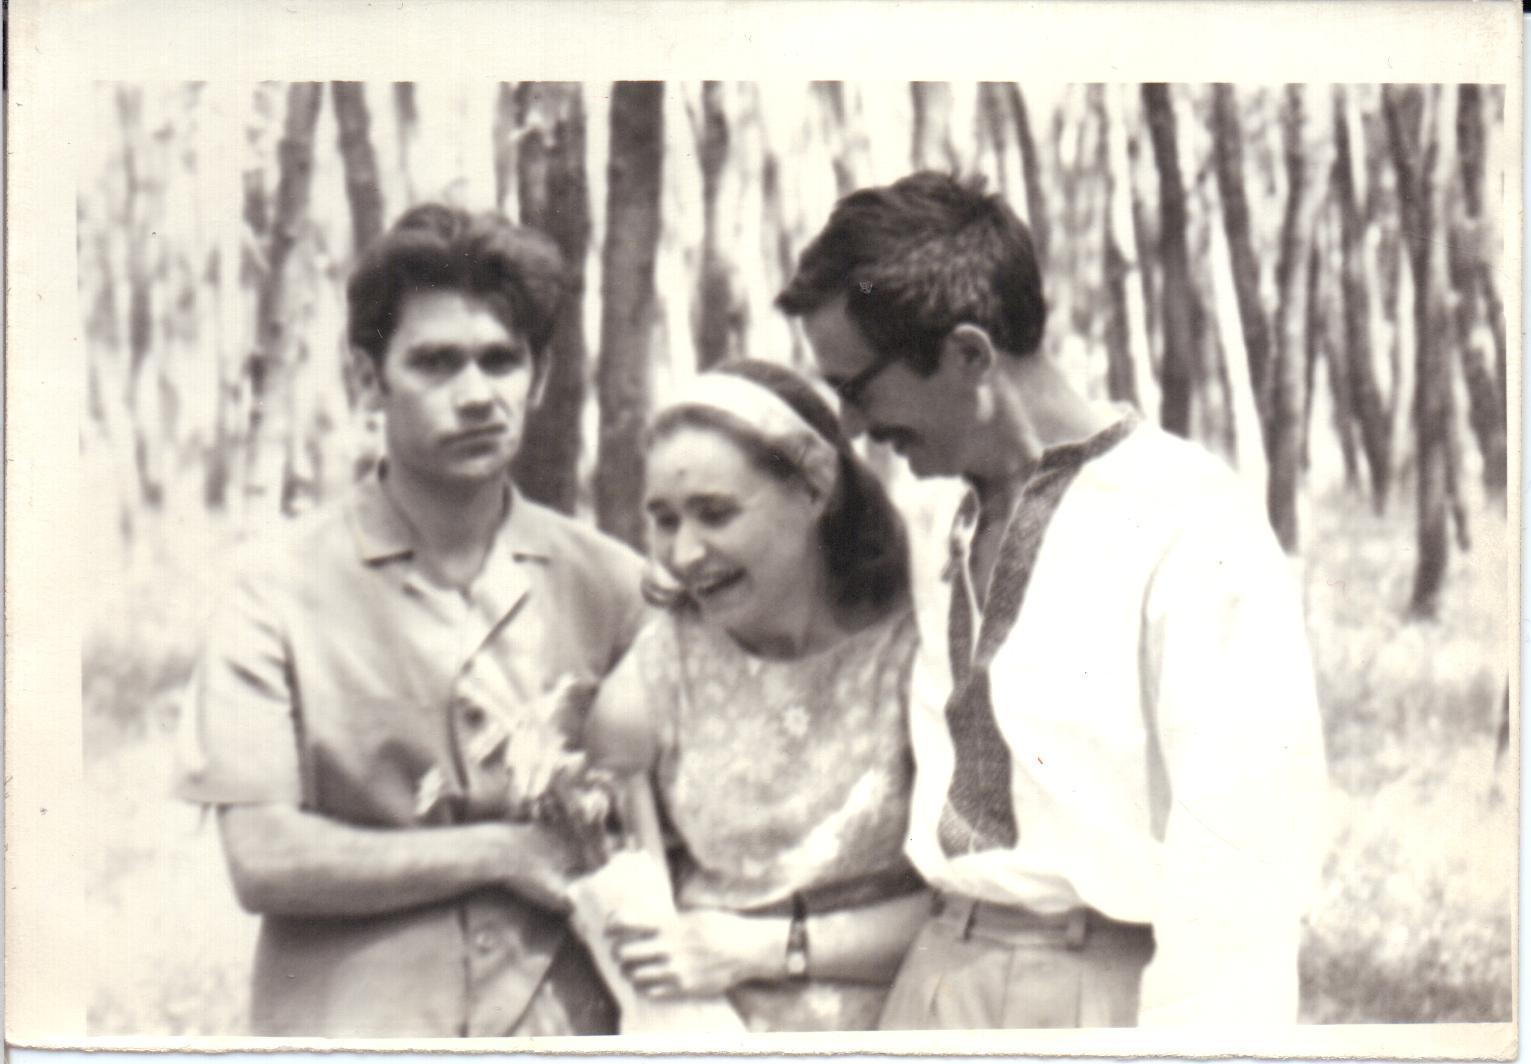 From left to right: Mykola Plakhotniuk, Nadia Svitlychna, Ivan Rusyn, 1960s